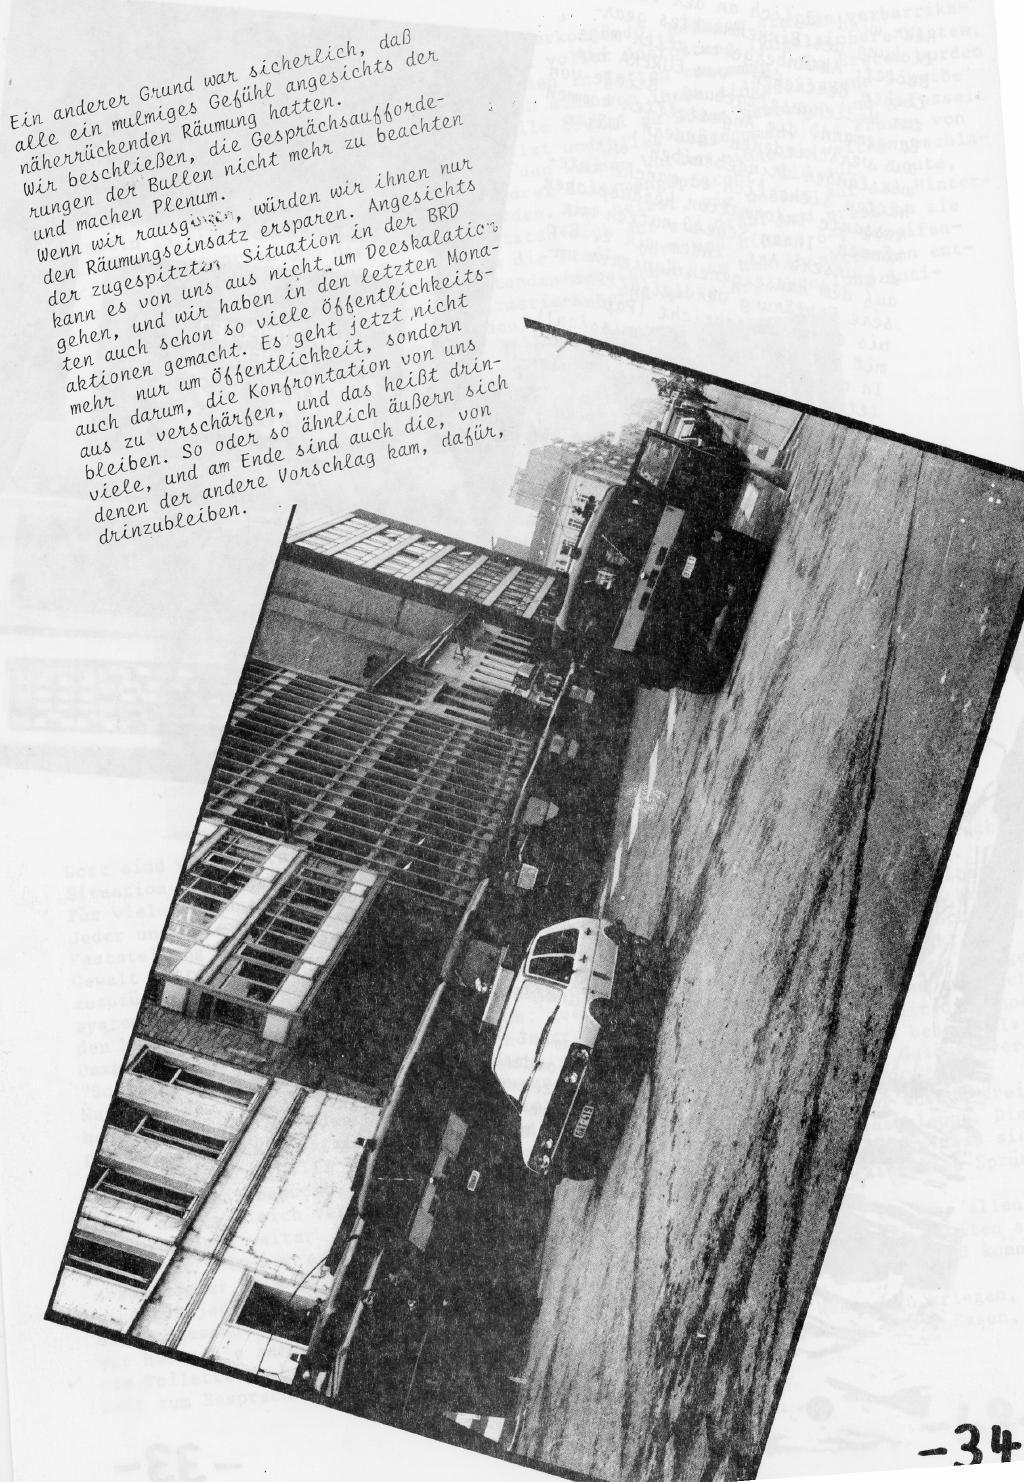 Belgien_Doku_Besetzung_EG_Kommission_1989_036